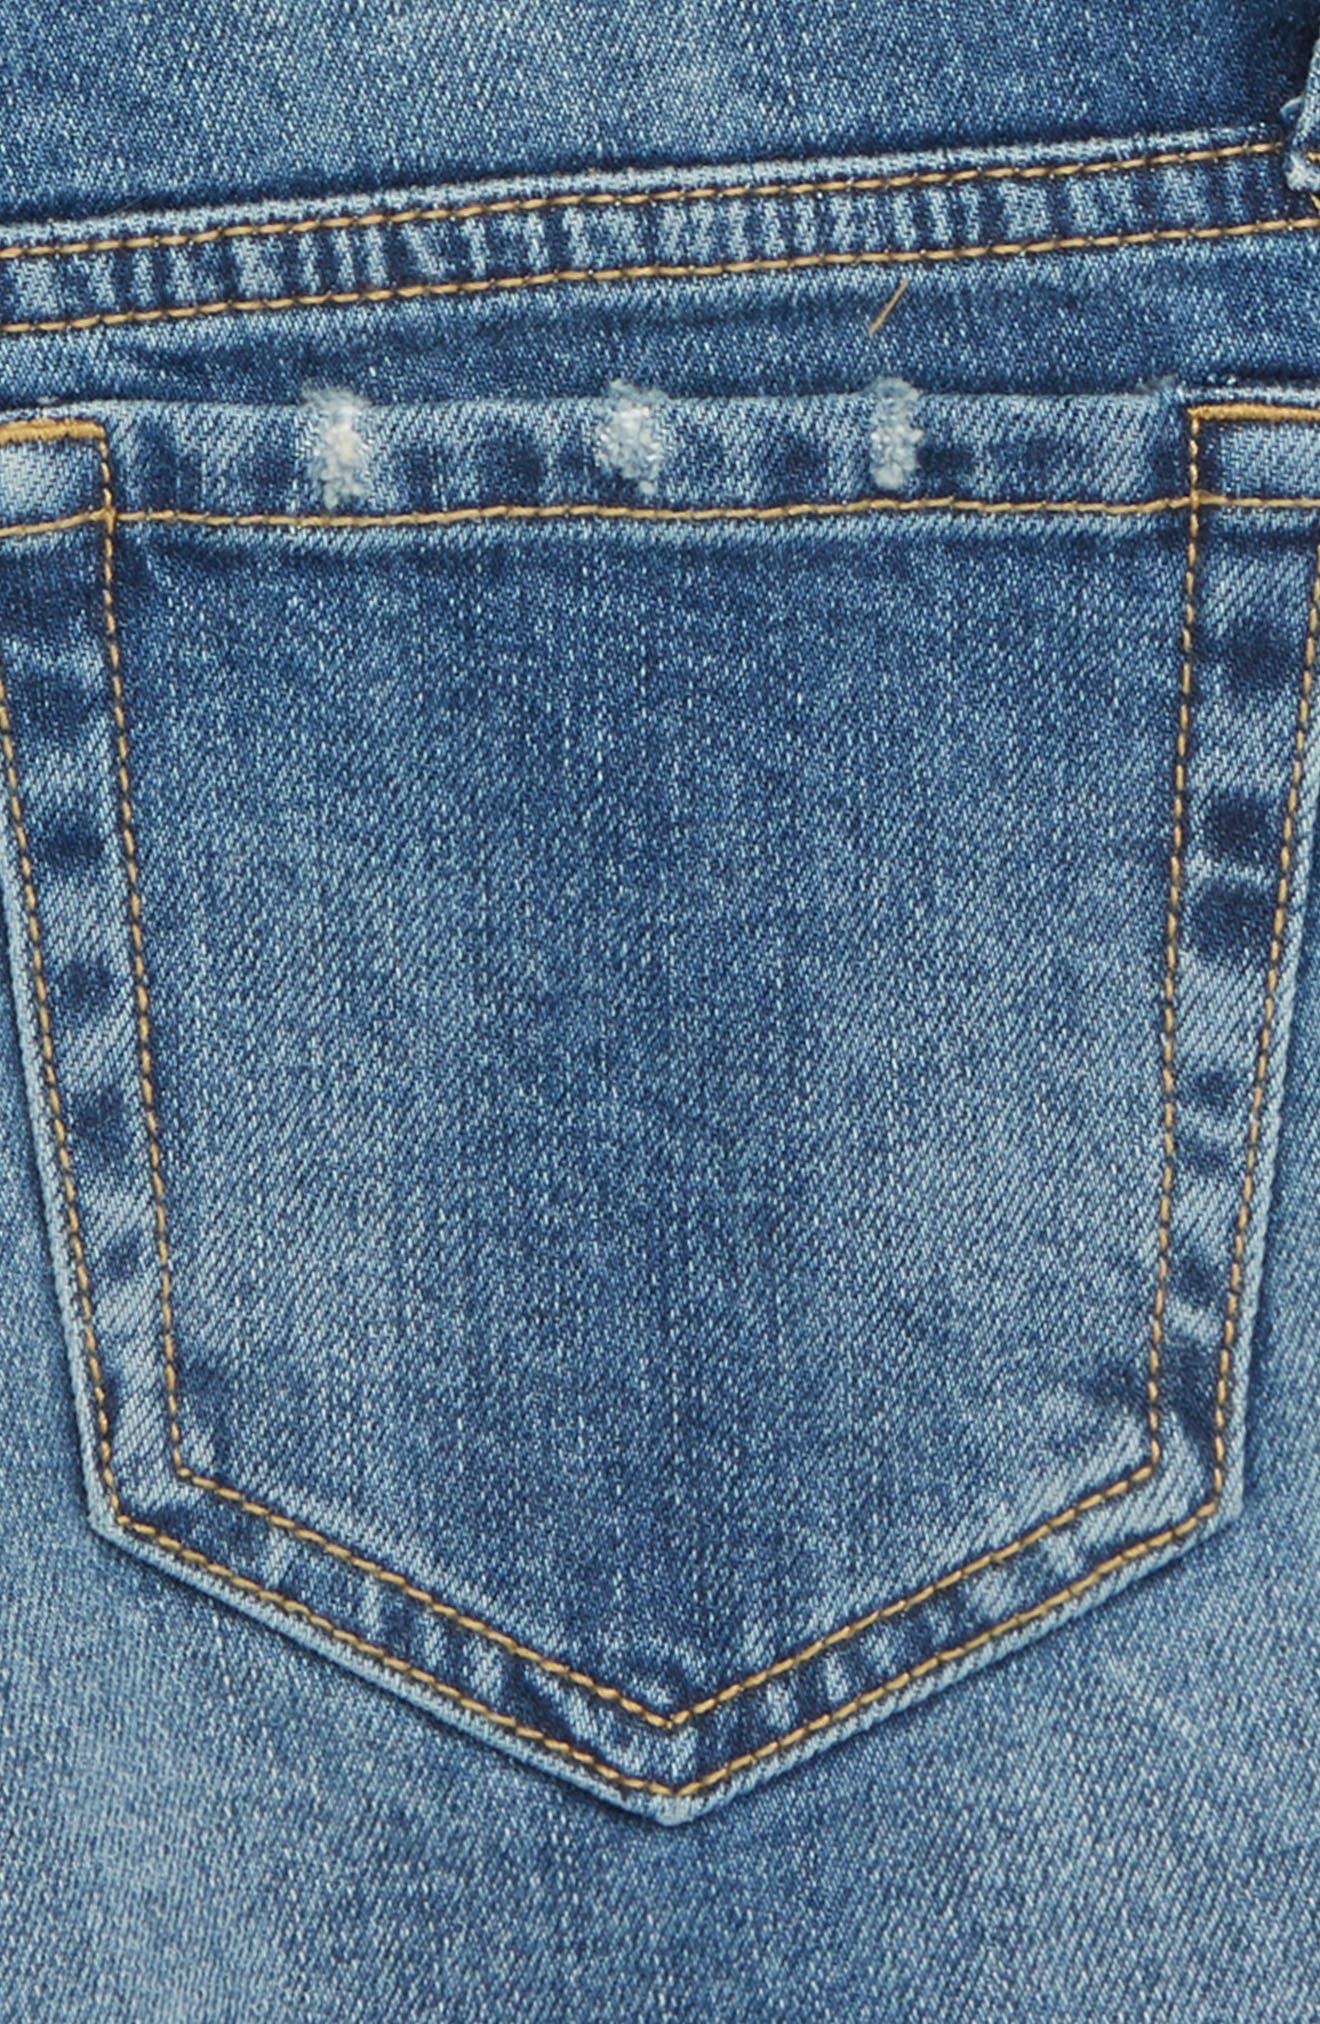 Festival Distressed Cutoff Denim Shorts,                             Alternate thumbnail 3, color,